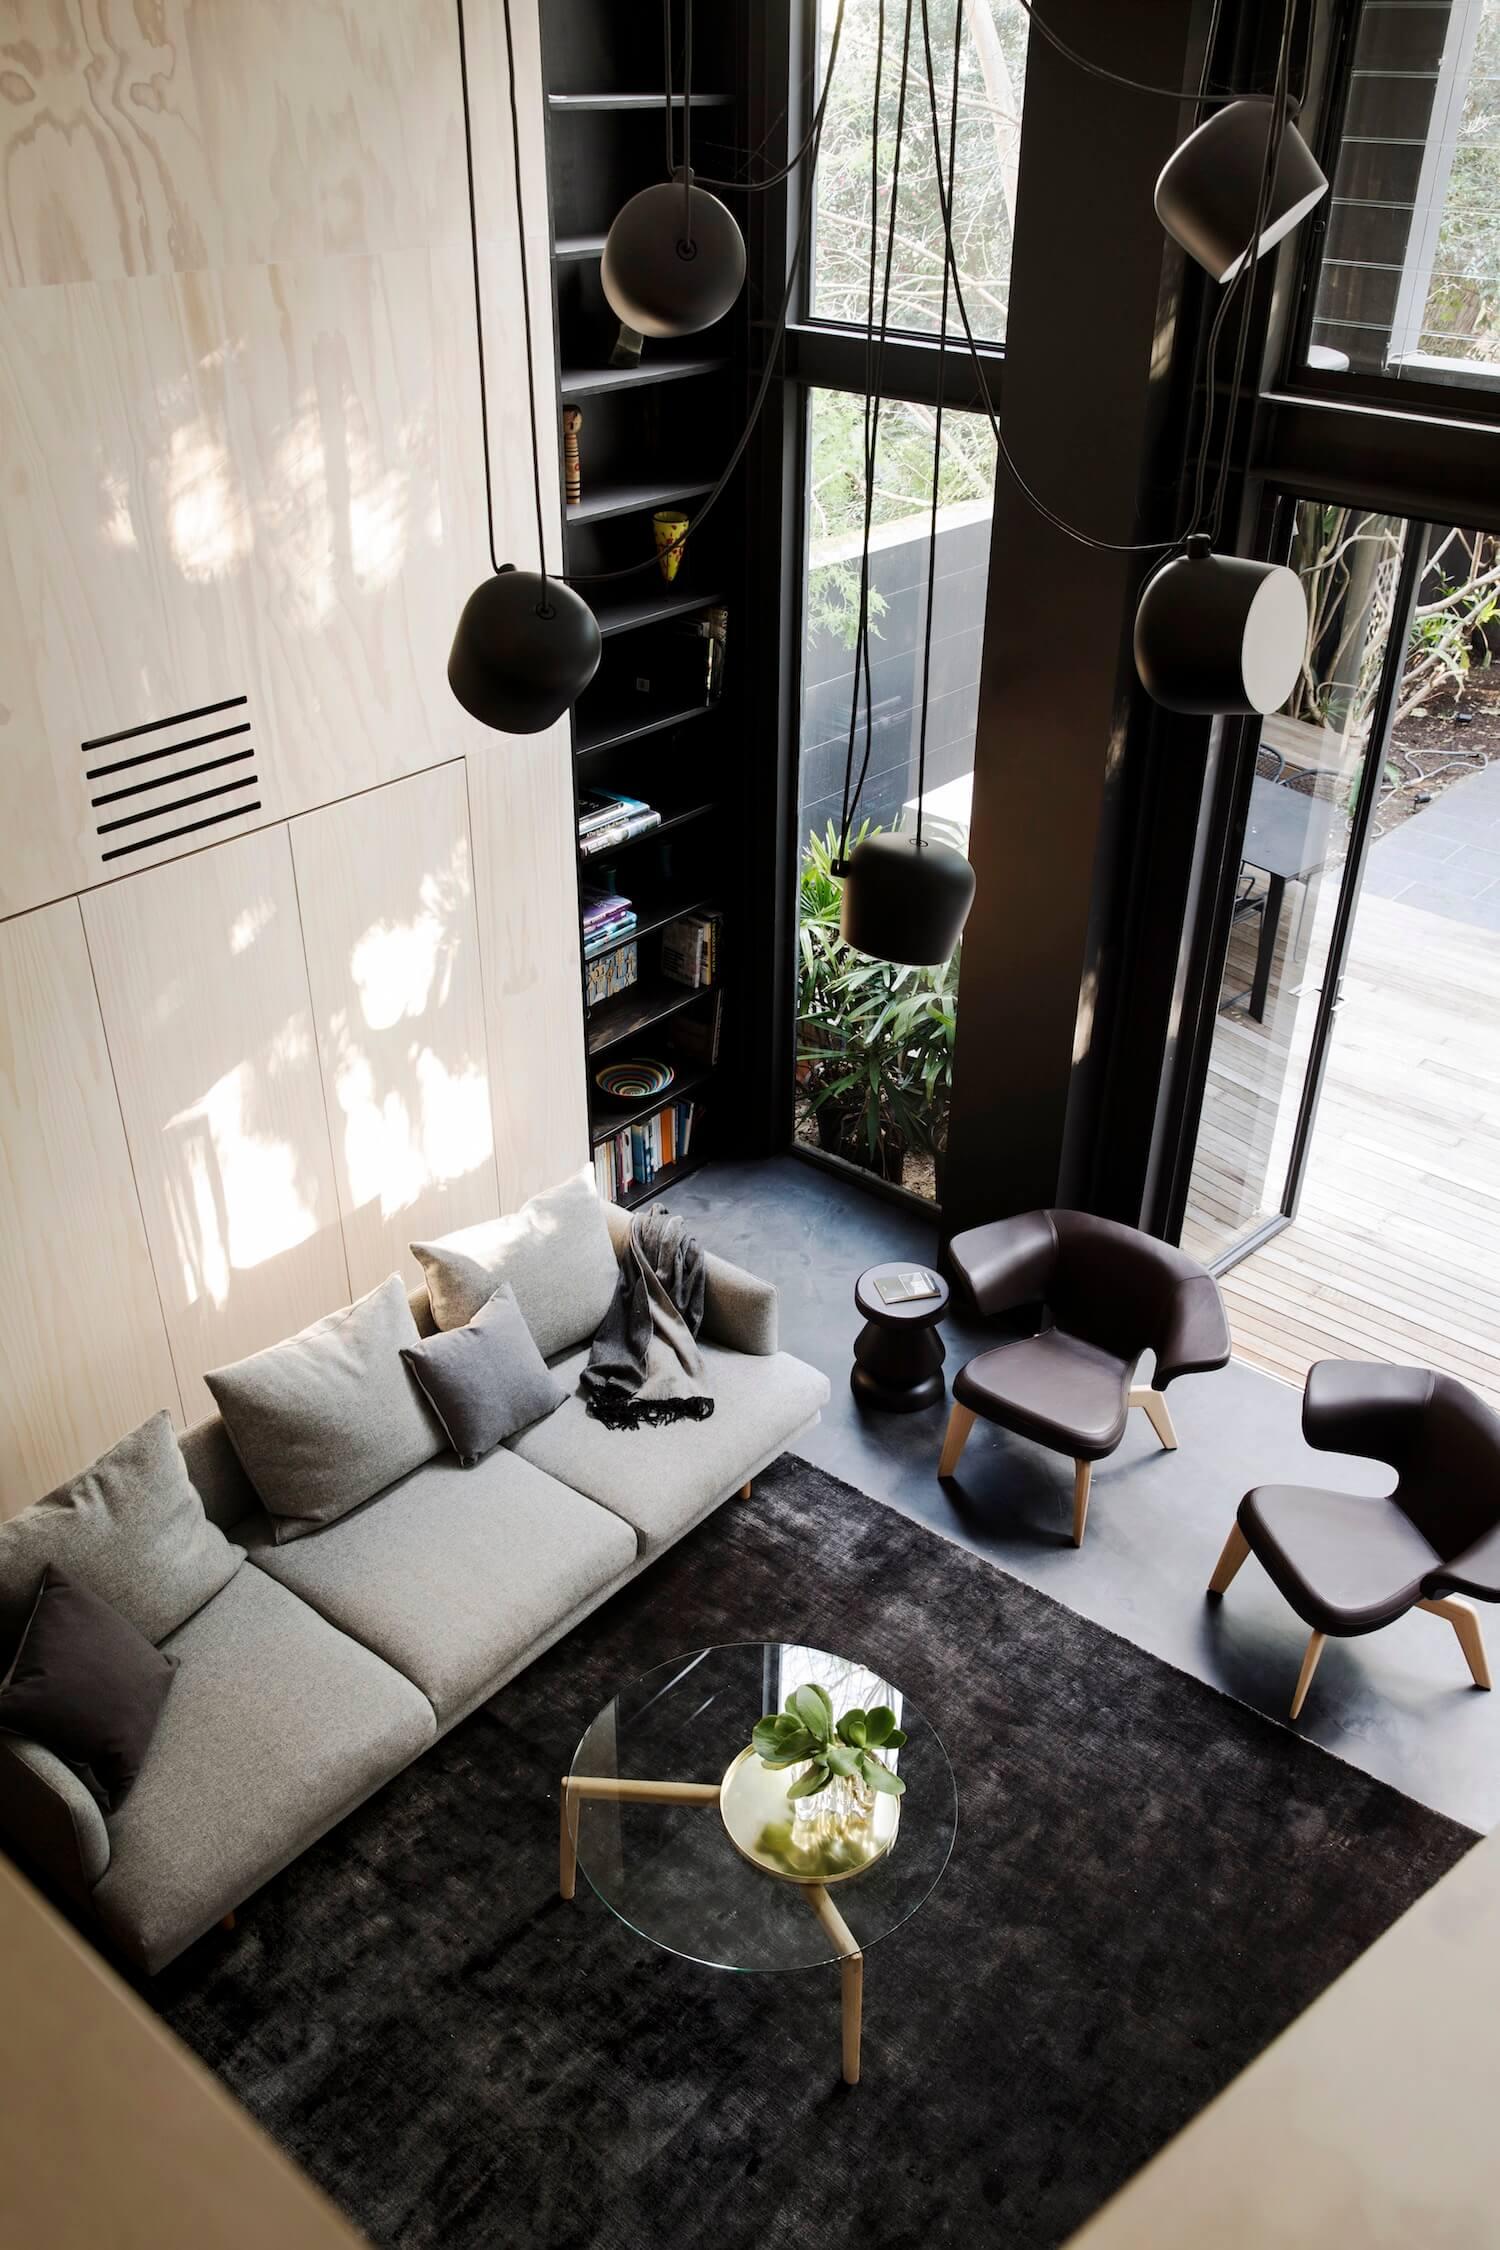 est living architect prineas interview house elysium void